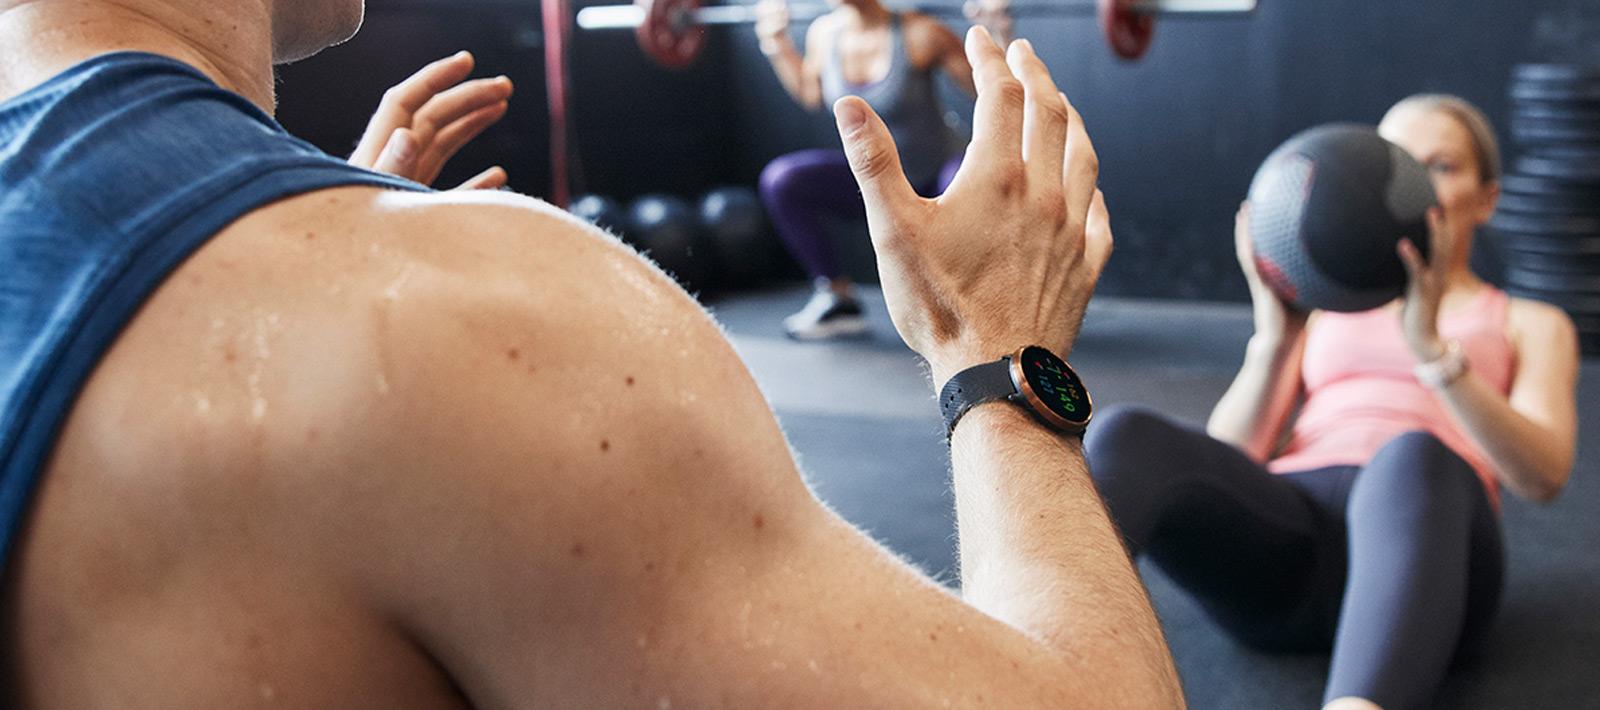 Polar fitness smartwatches